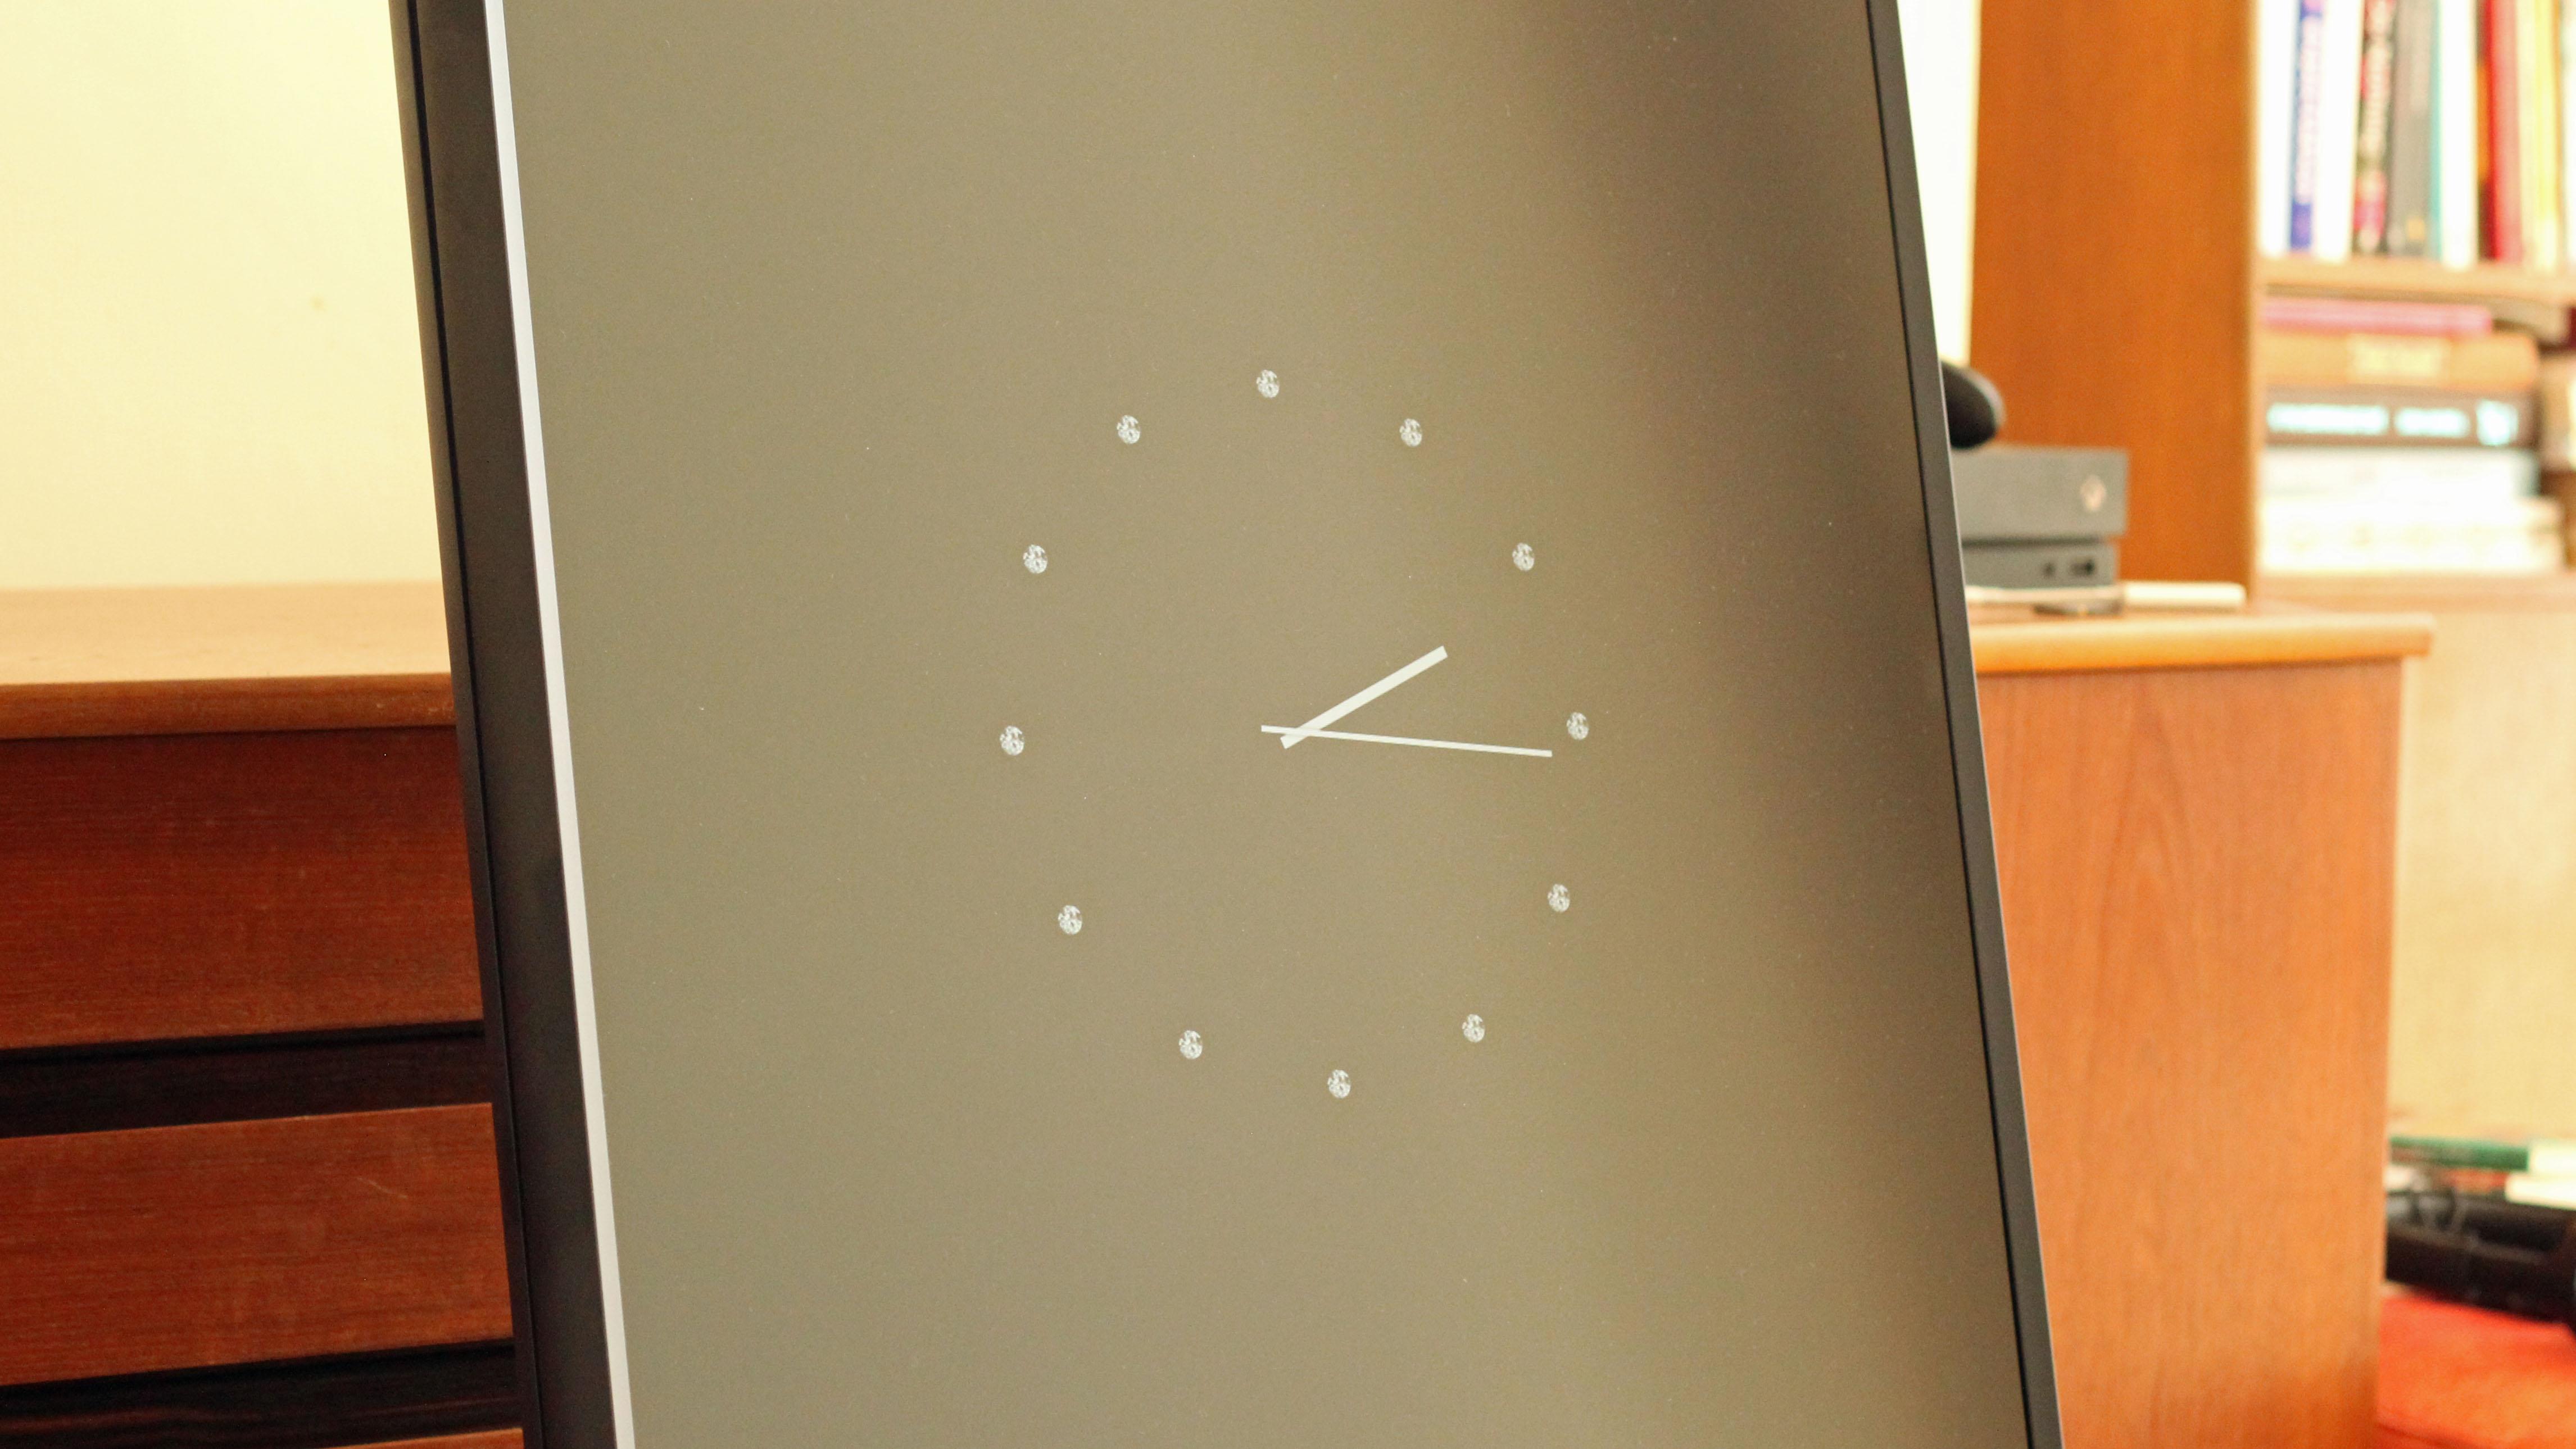 A fancy clock app displayed on the Samsung Sero TV